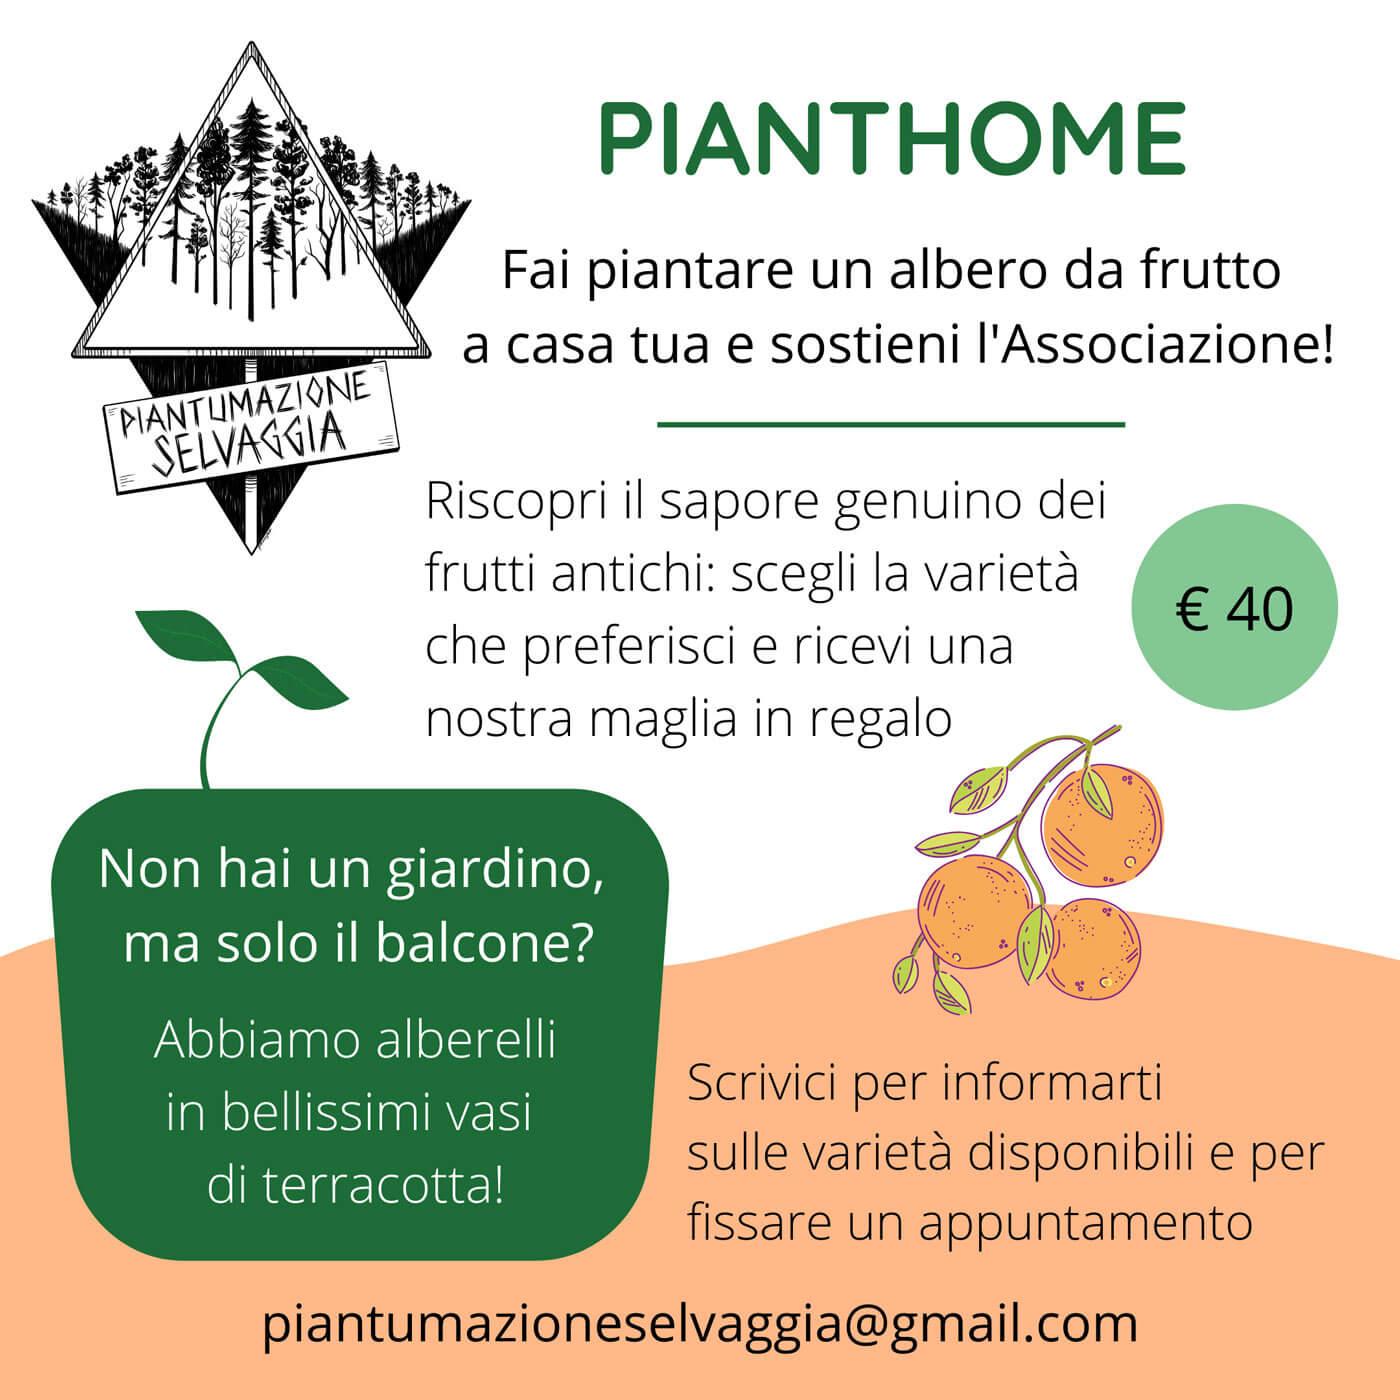 PIANTHOME!